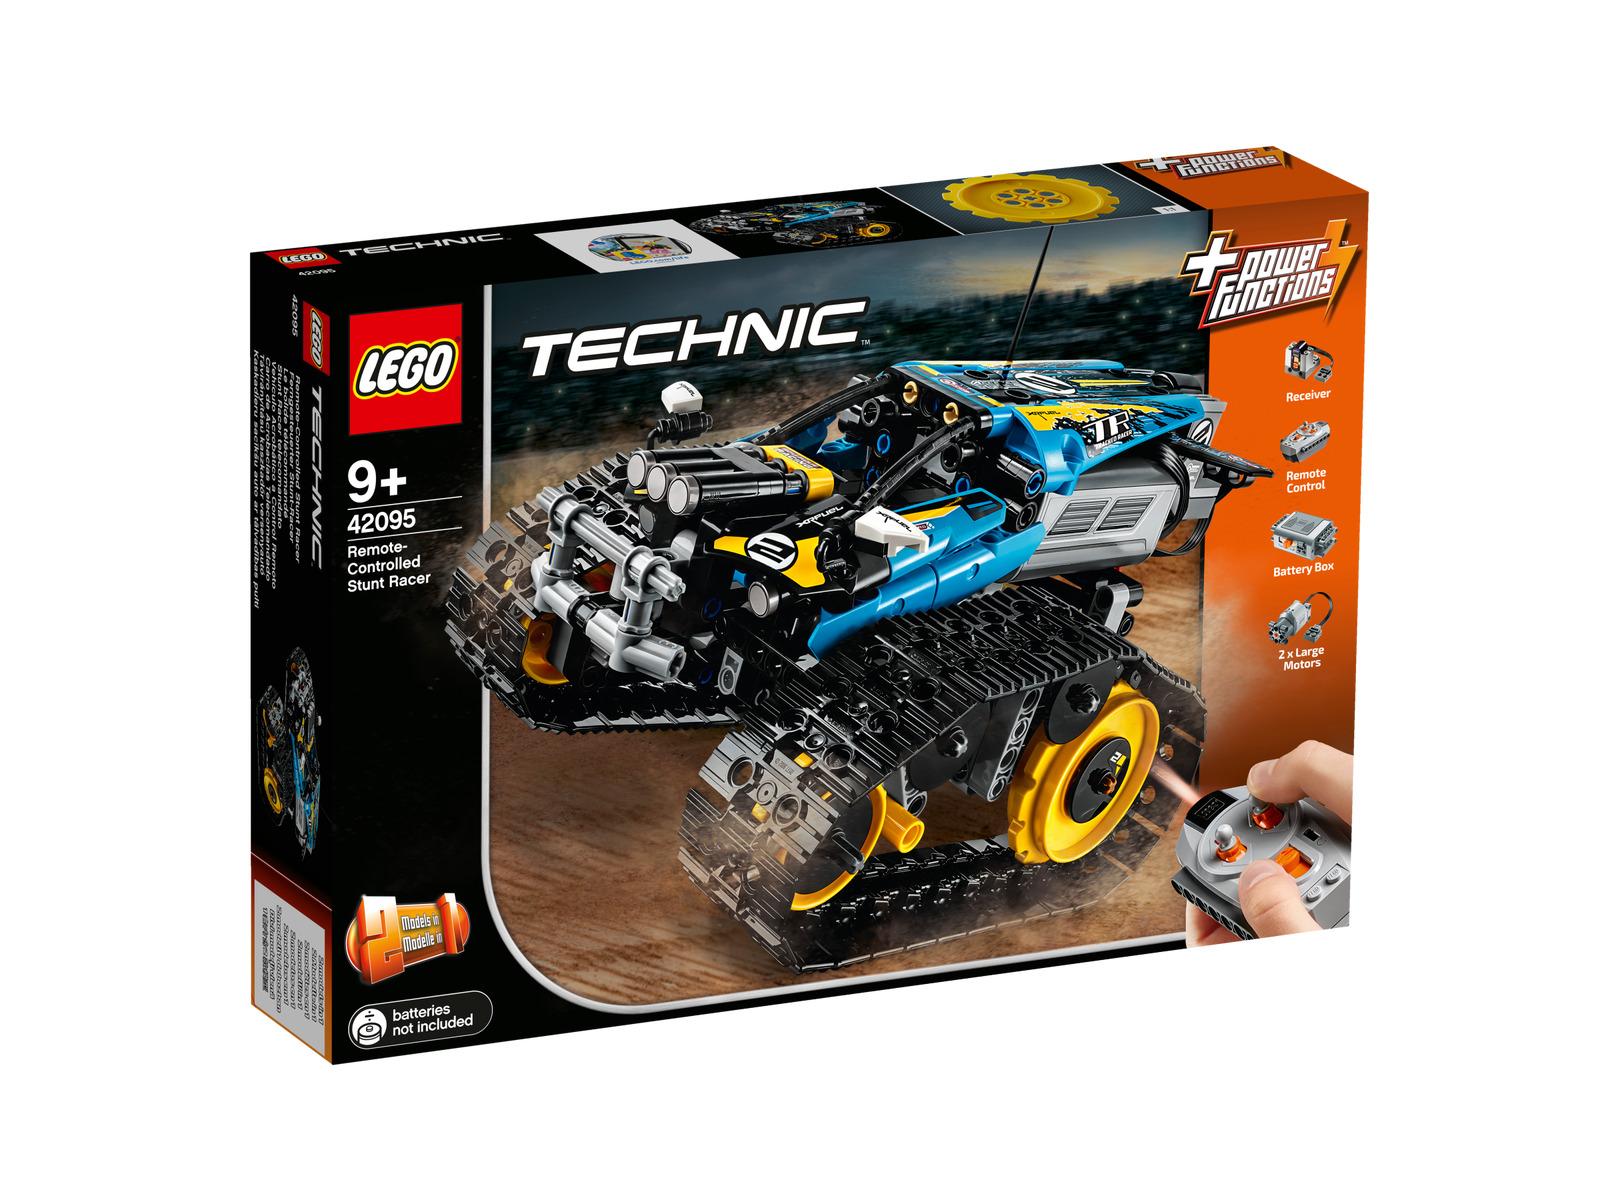 Lego Technic Ferngesteuerter Stunt-Racer (42095) Neu